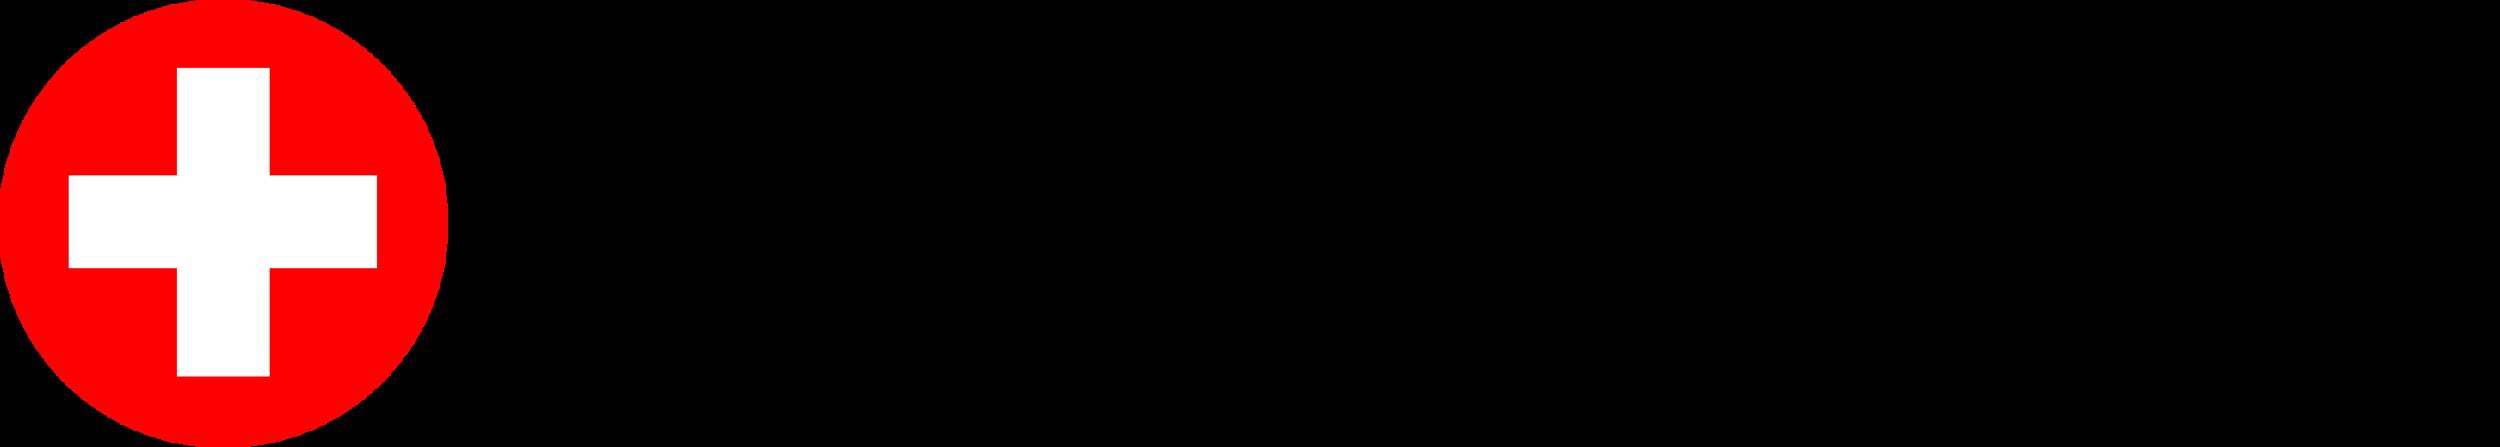 surge-doctor-logo.png